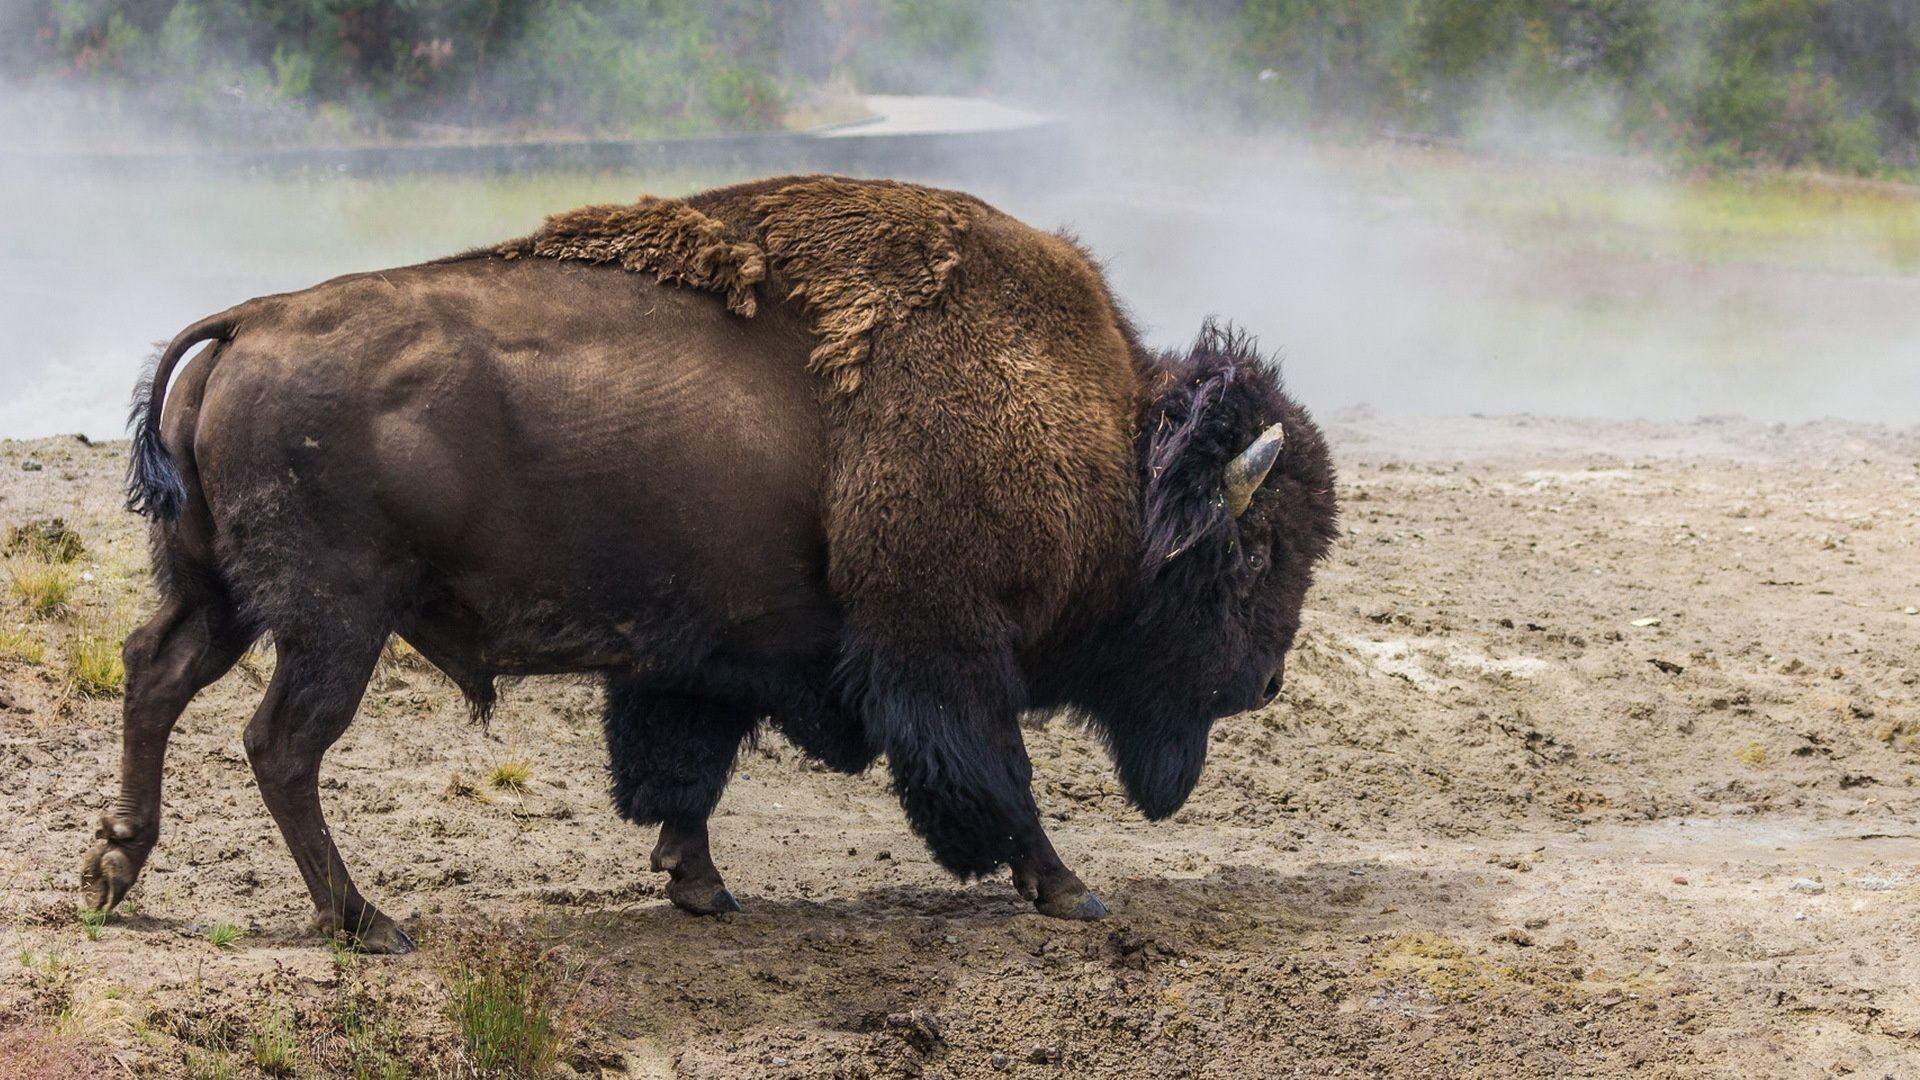 Buffalo Big Picture